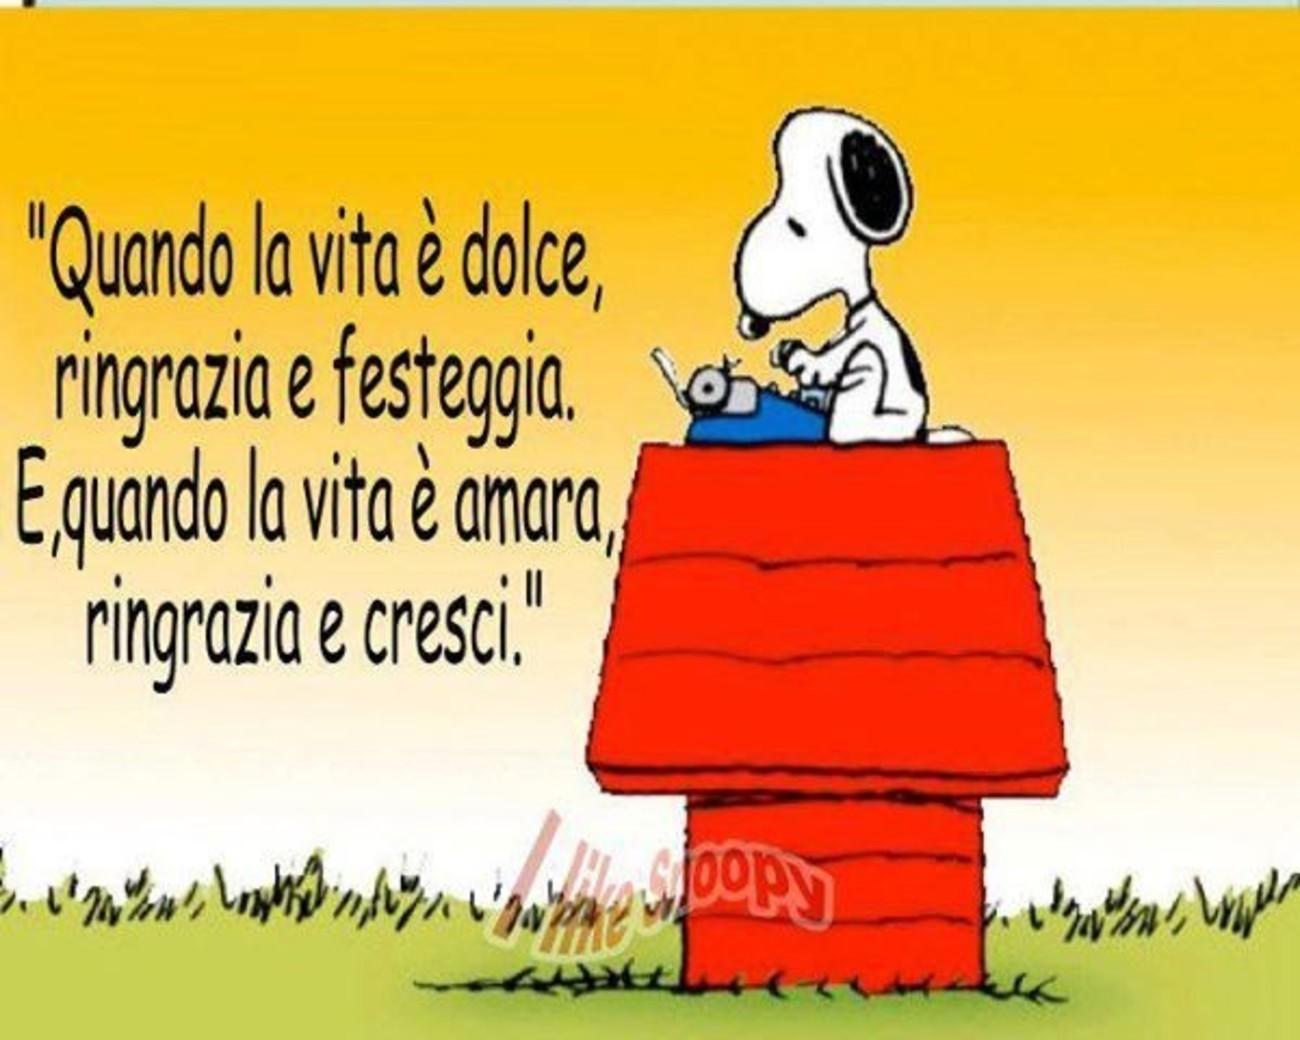 Snoopy immagini con frasi archives for Immagini snoopy gratis